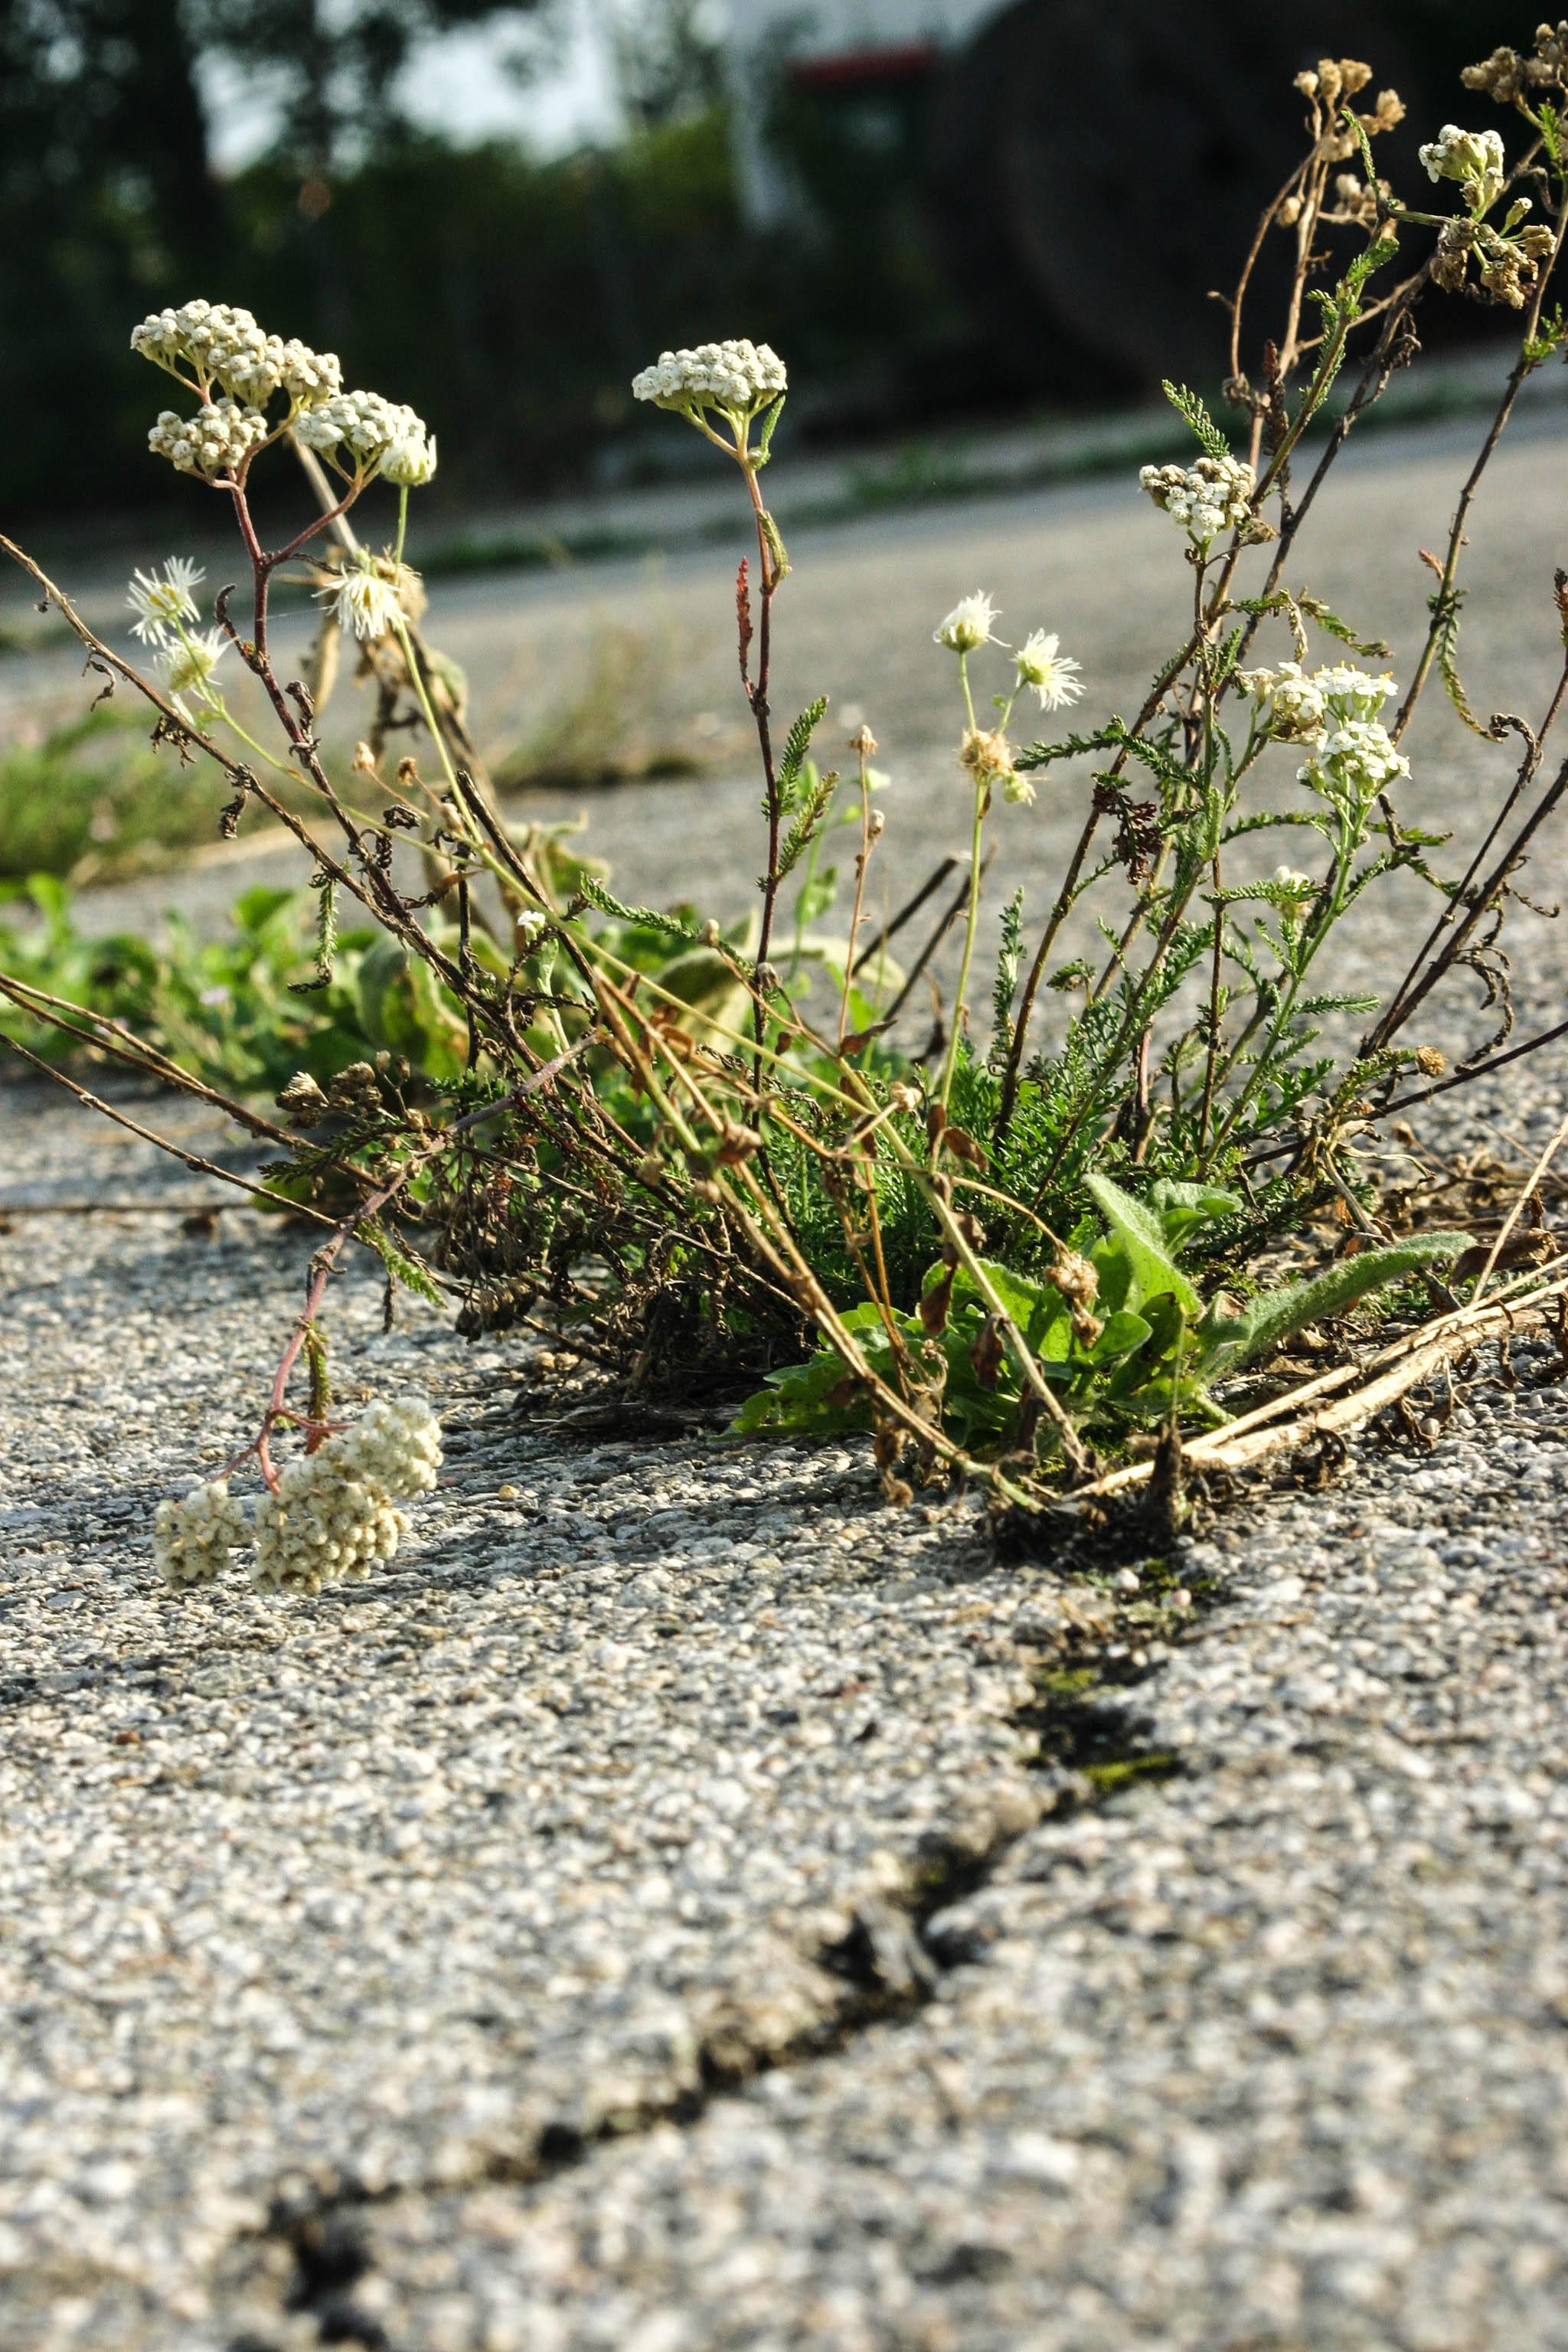 banco de imagens rvore ramo flor plantar estrada folha flor asfalto padronizar verde erva produzir solo rachadura botnica lacuna flora